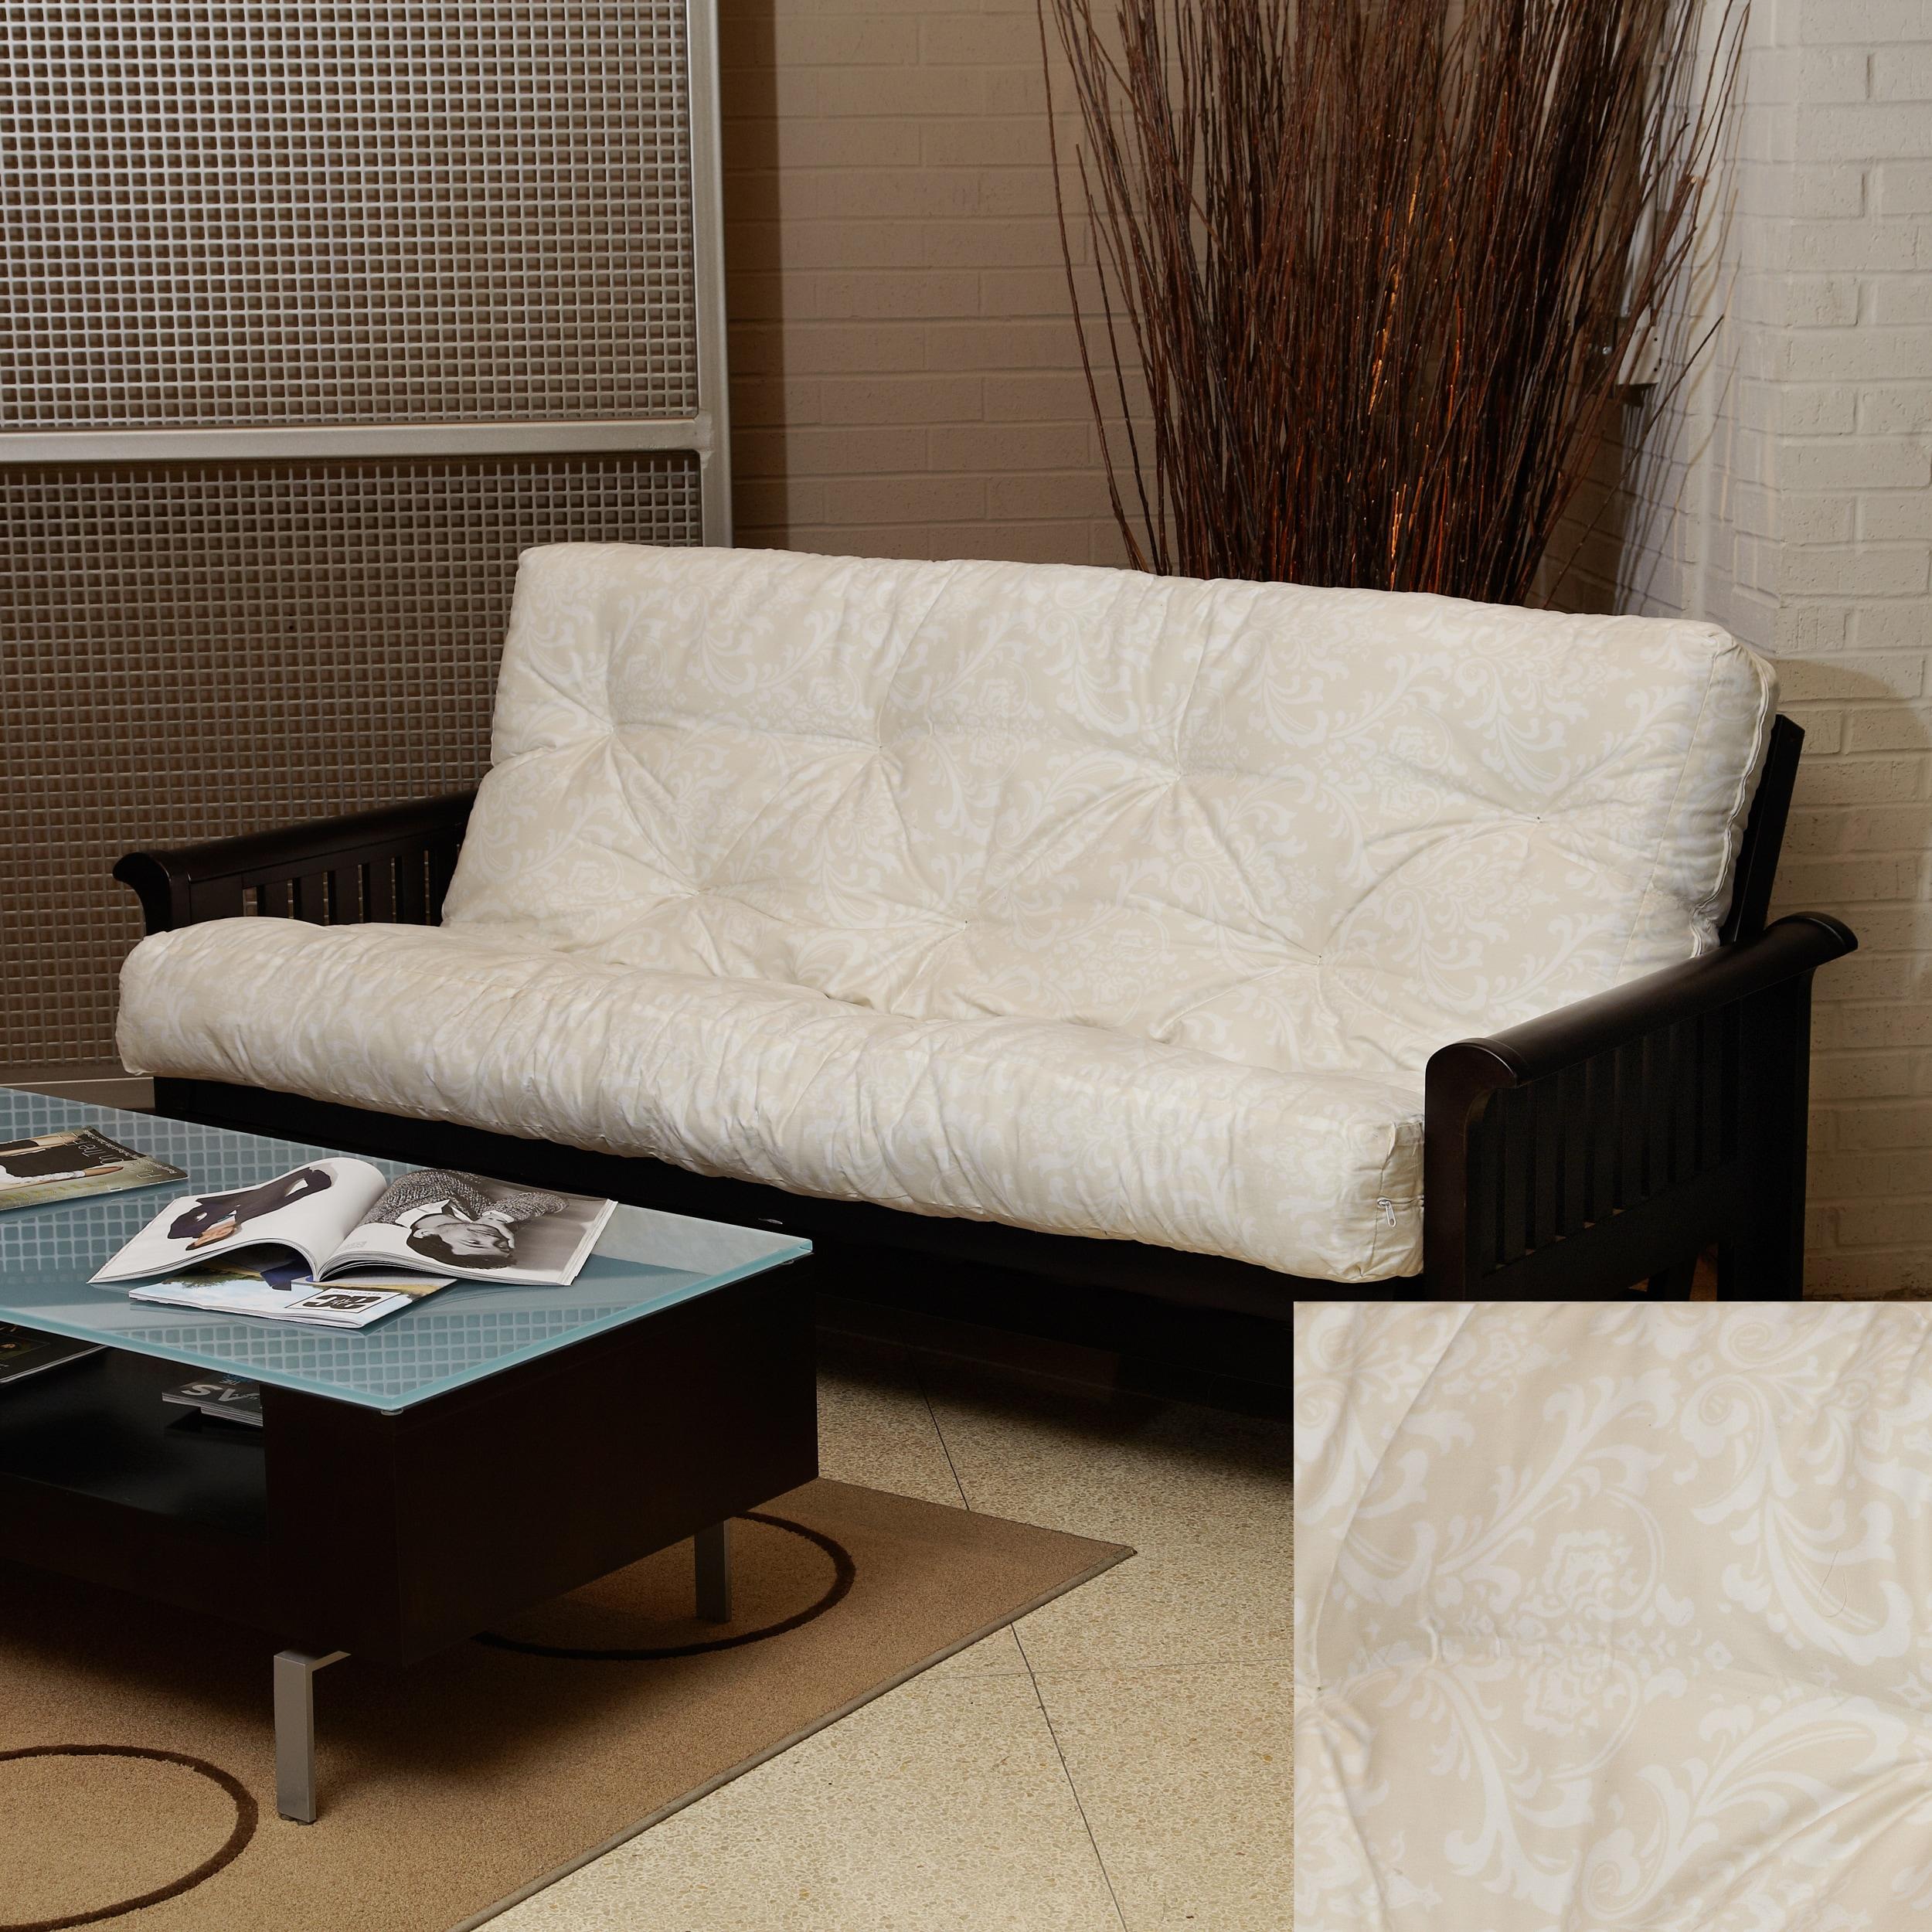 Beige Damask Full-Size 12-inch Futon Mattress